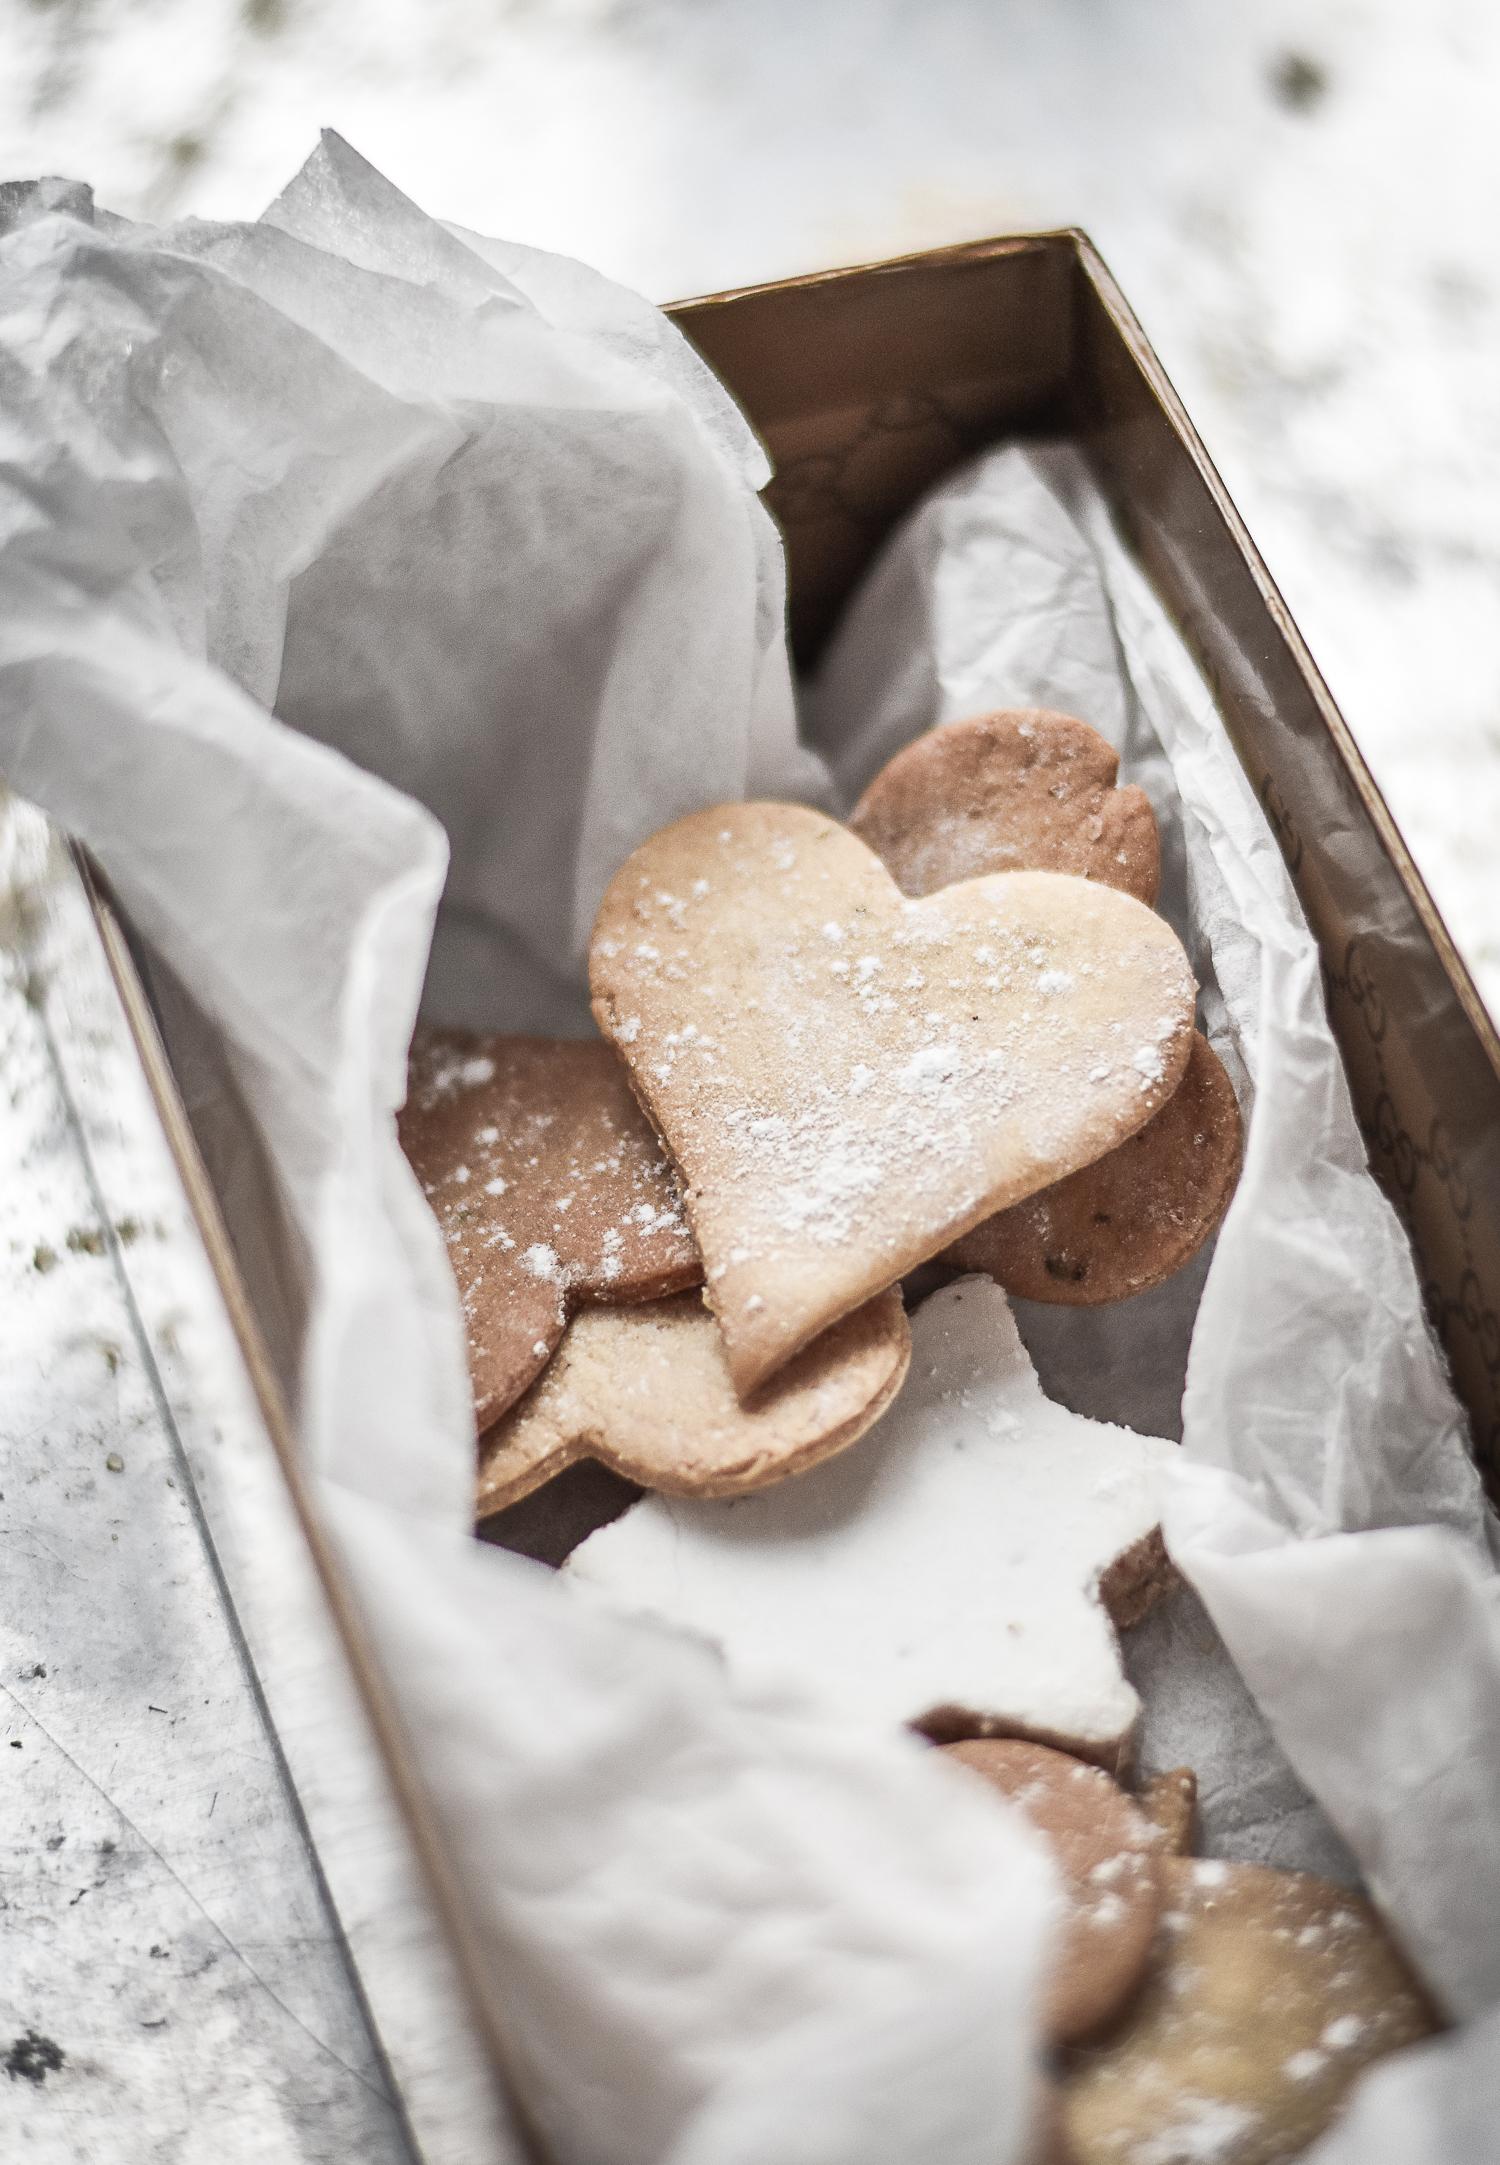 Baking Swedish Gingerbread Cookies